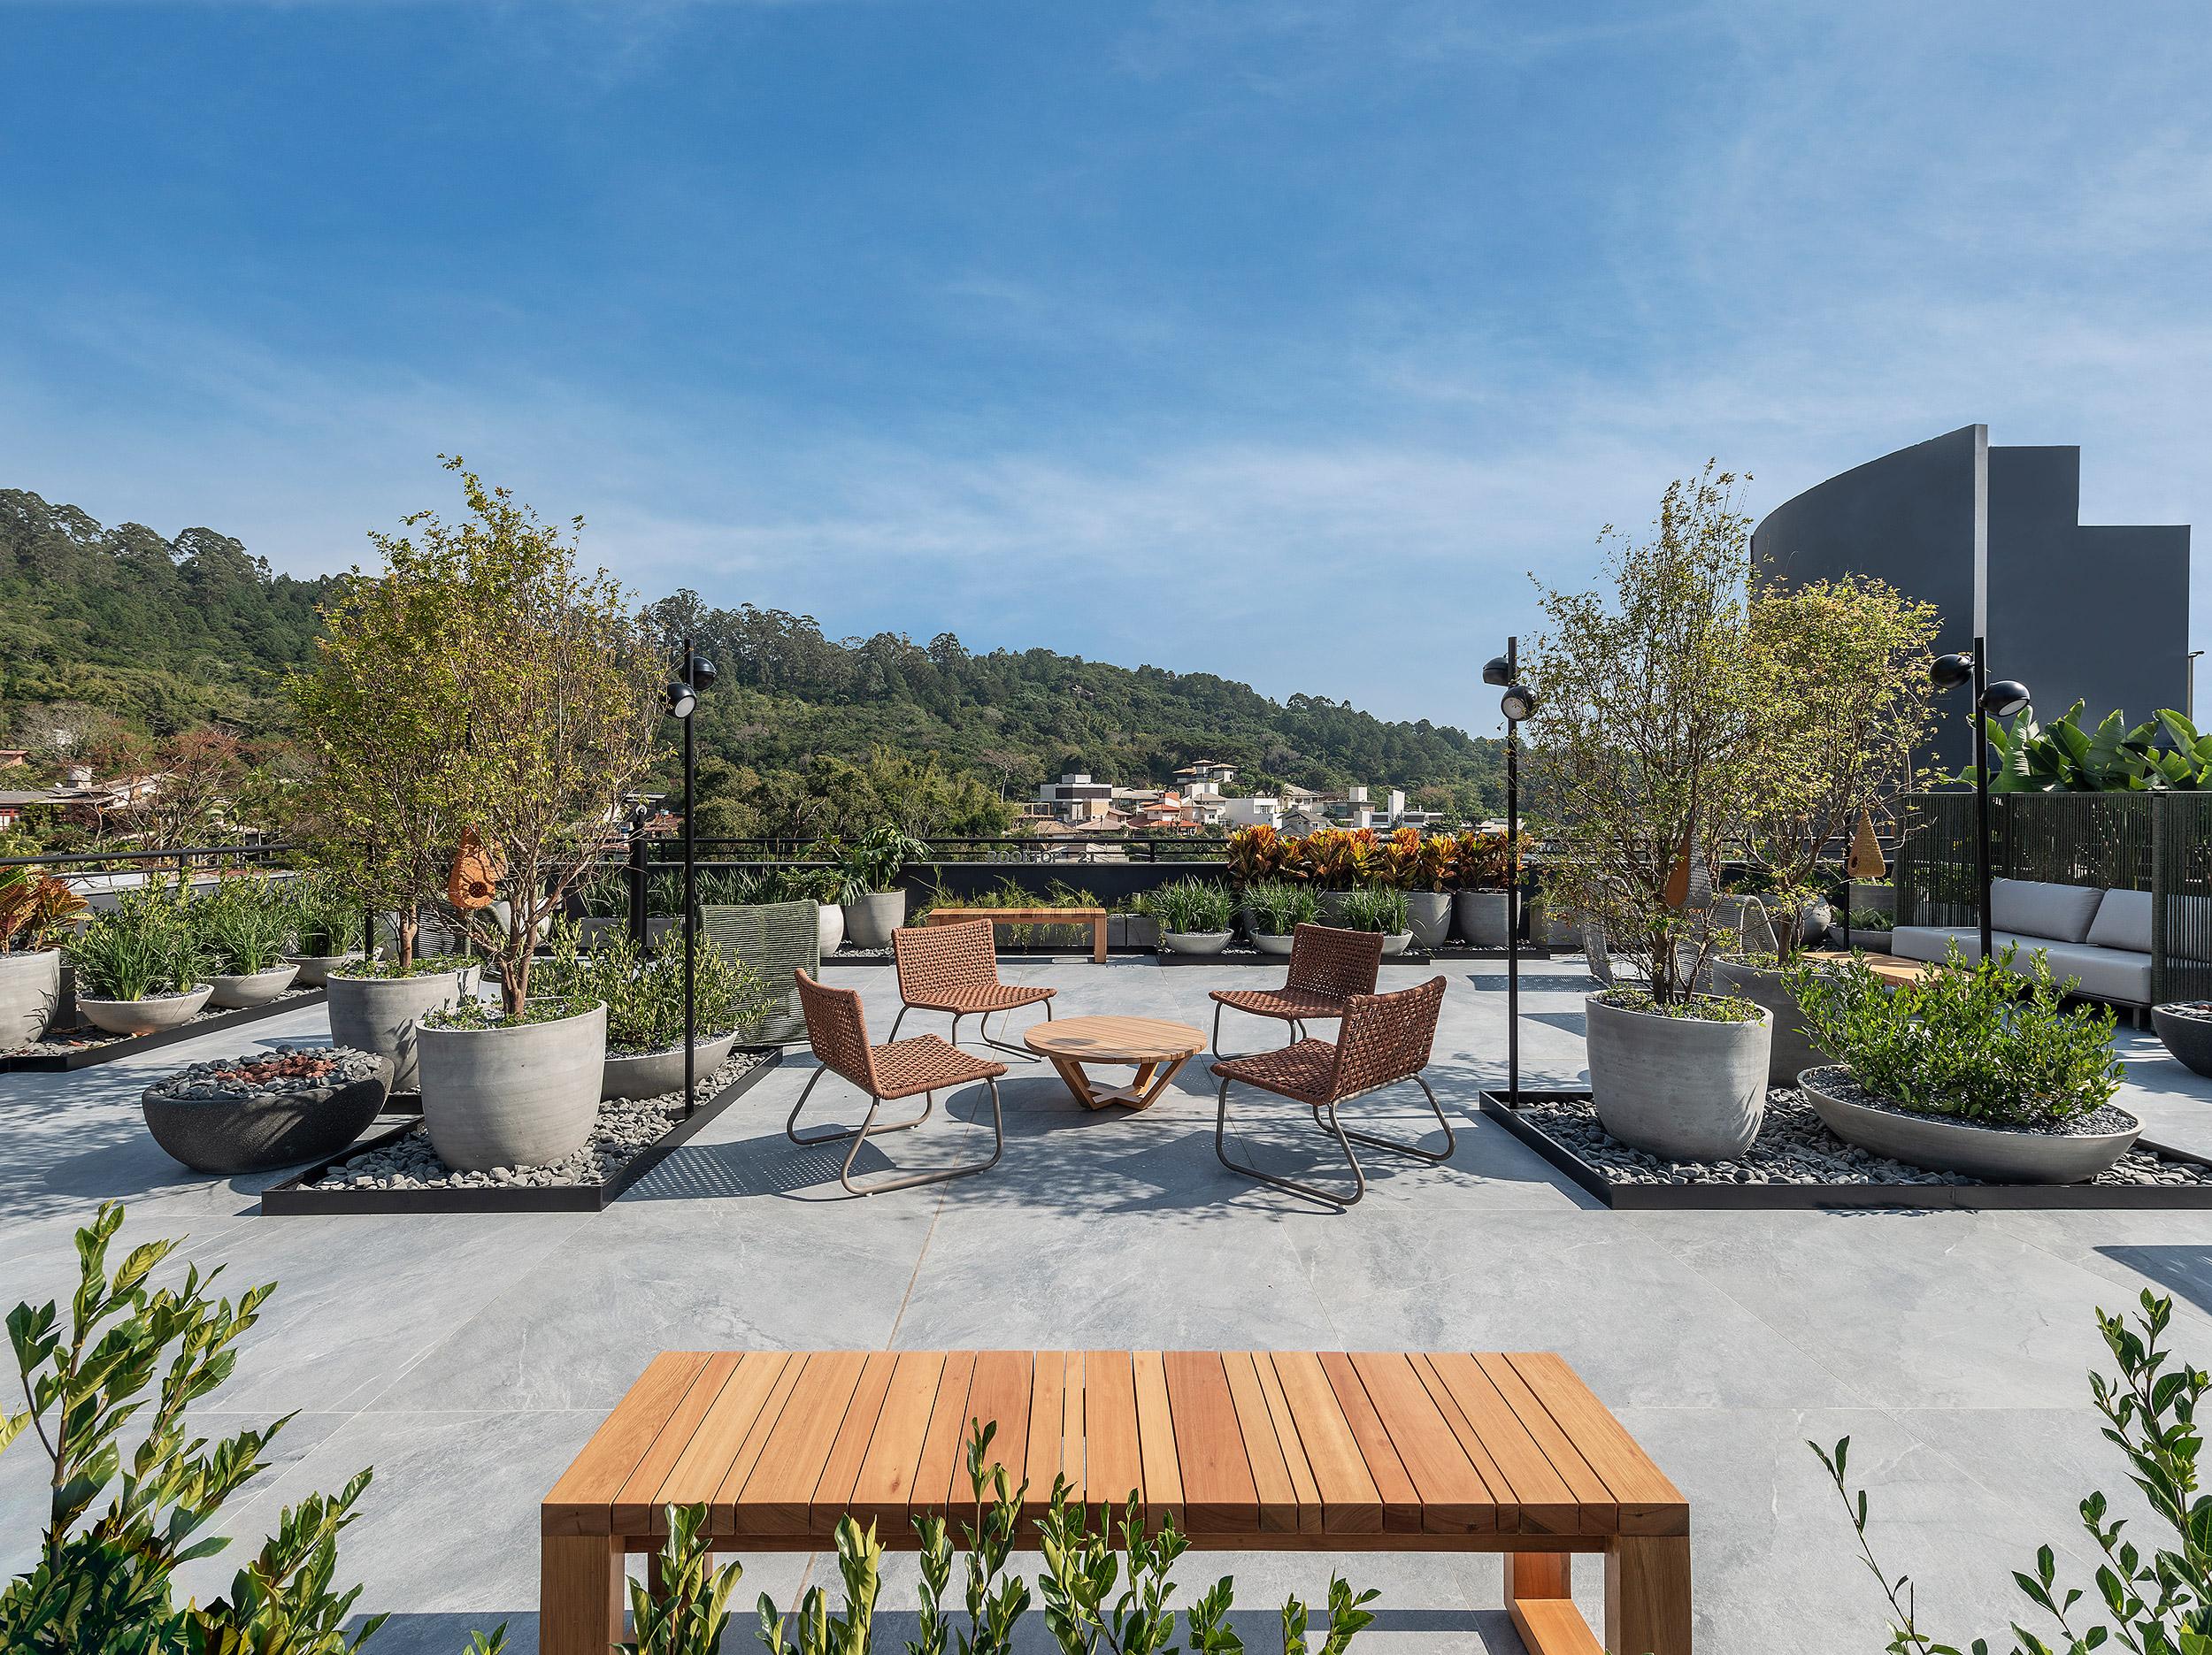 Rooftop 20 I 21 - Ana Trevisan   Paisagismo + Arquitetura. Projeto da CASACOR Santa Catarina 2021.